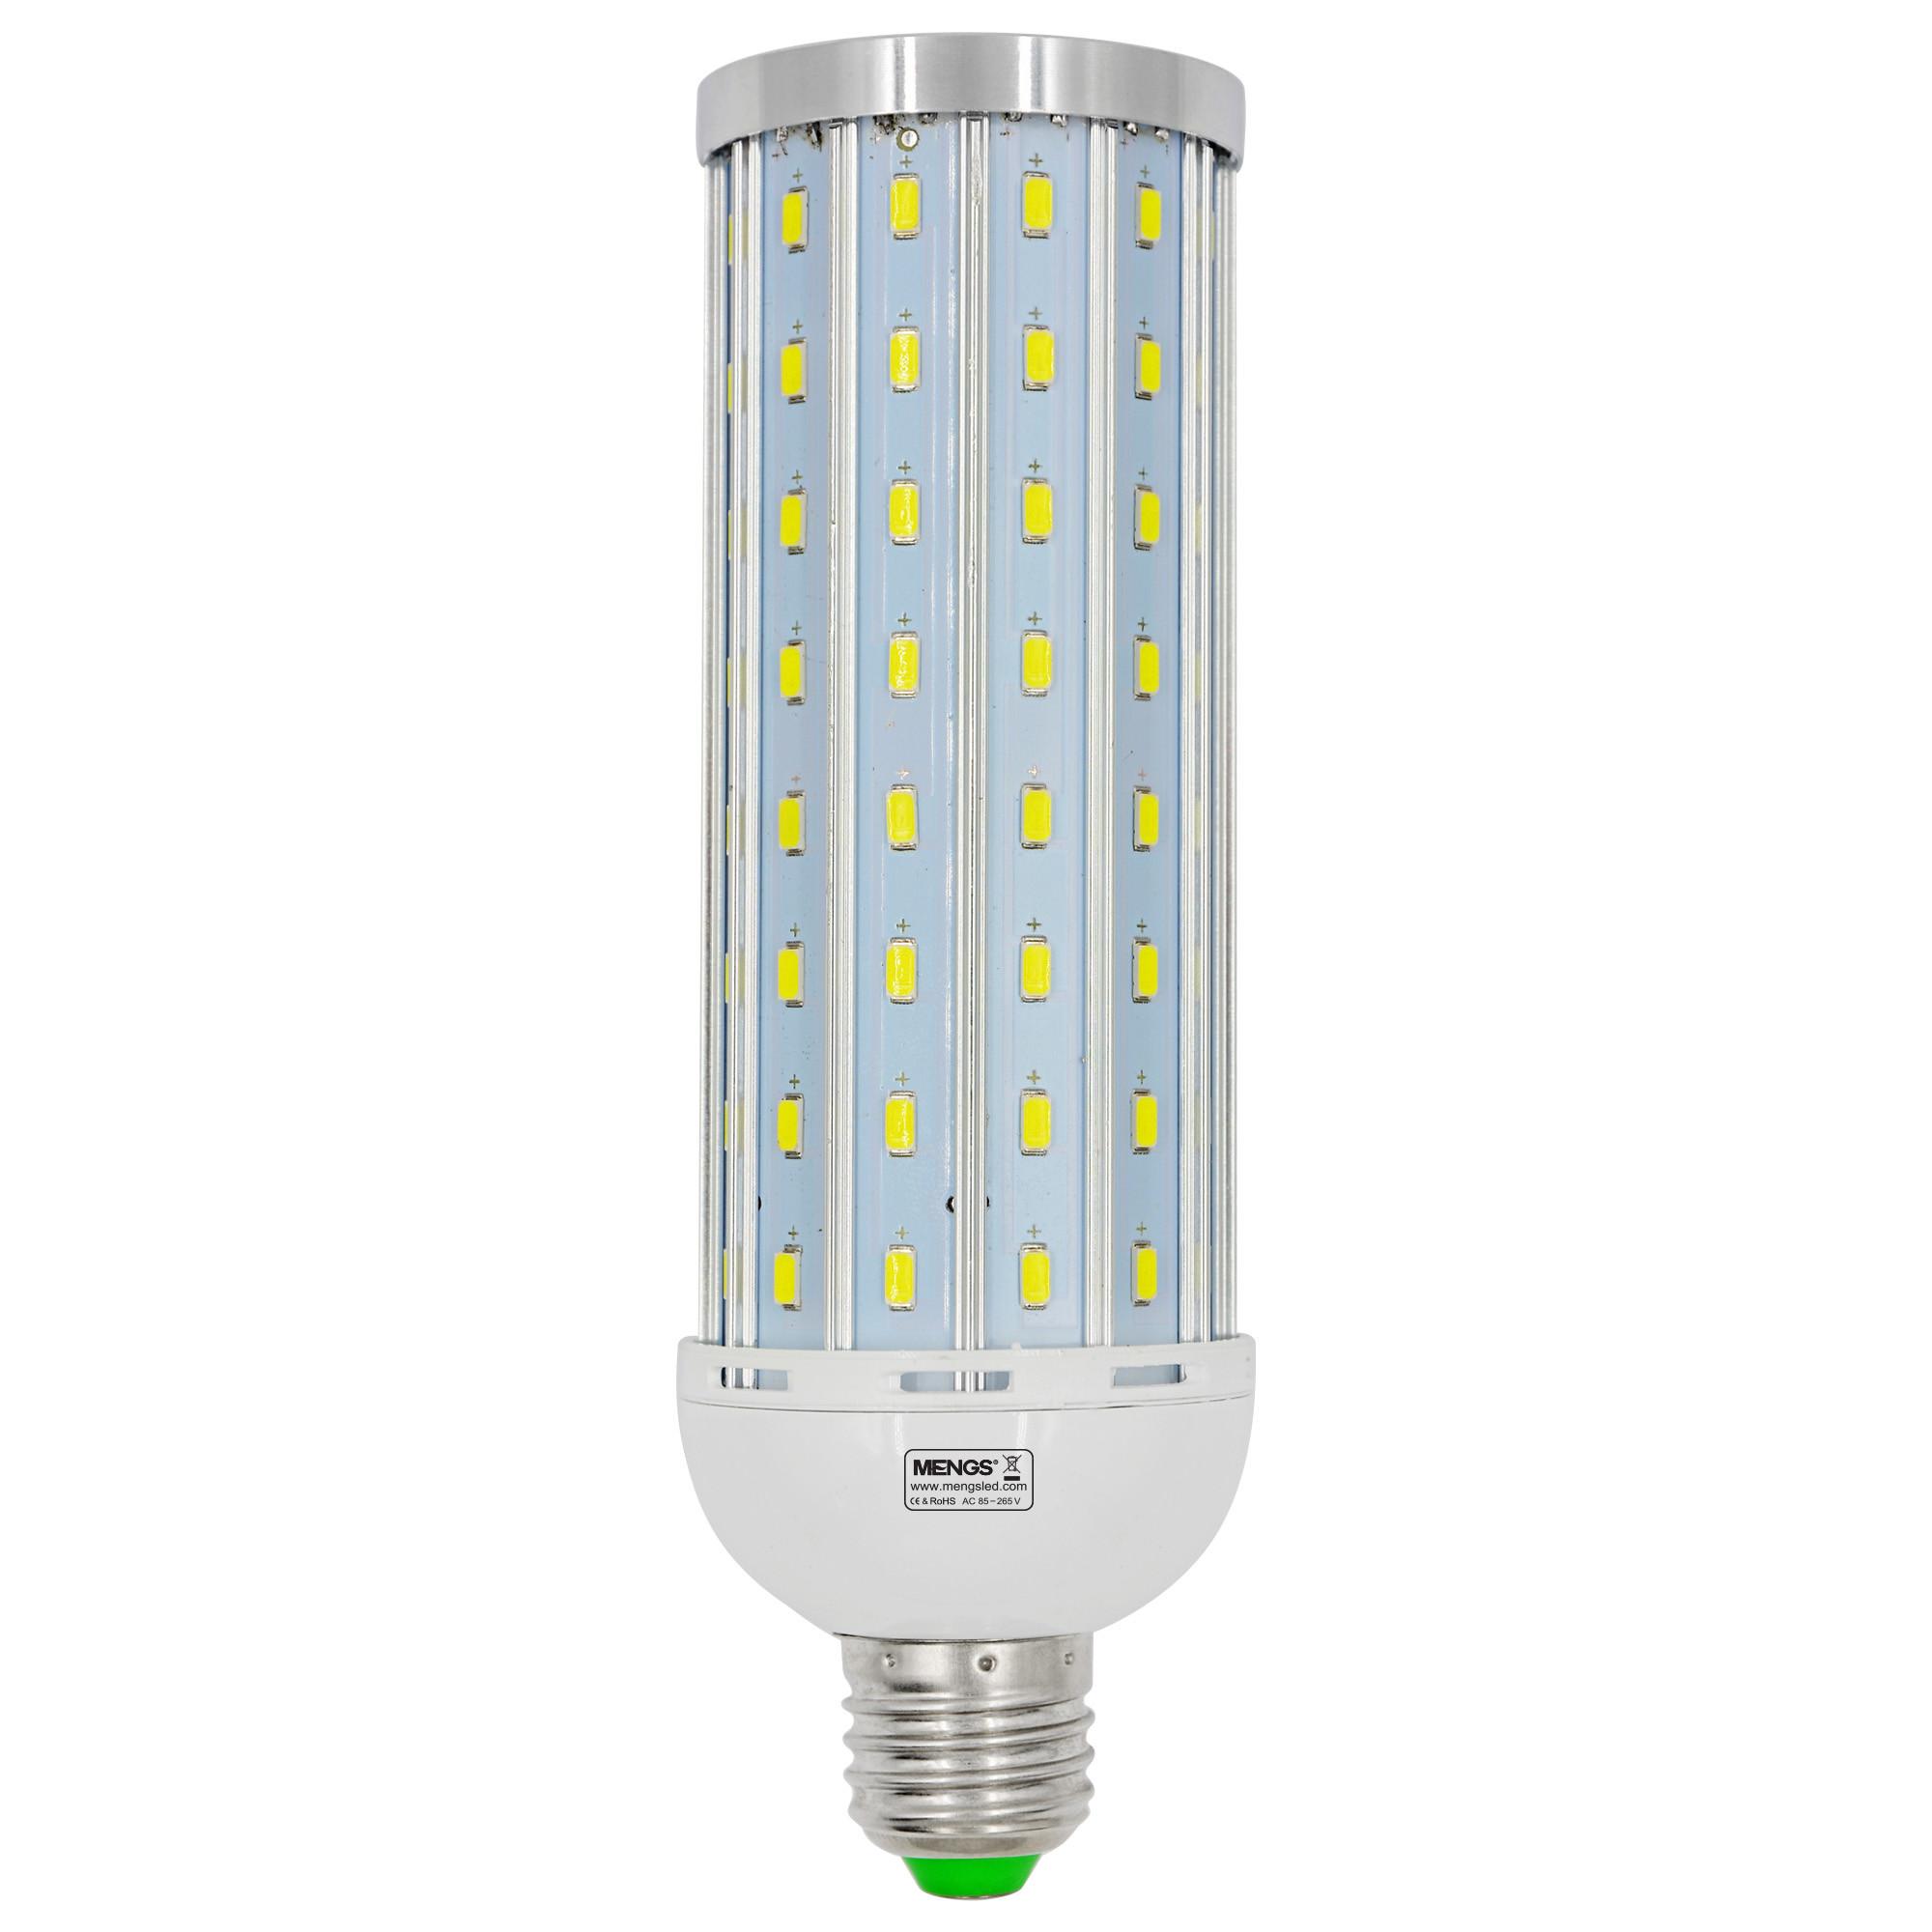 MENGS® Anti-Strobe E27 30W LED Corn Light 112x 5730 SMD LED Bulb Lamp With Aluminum Plate AC 85-265V In Cool White Energy-Saving Lamp